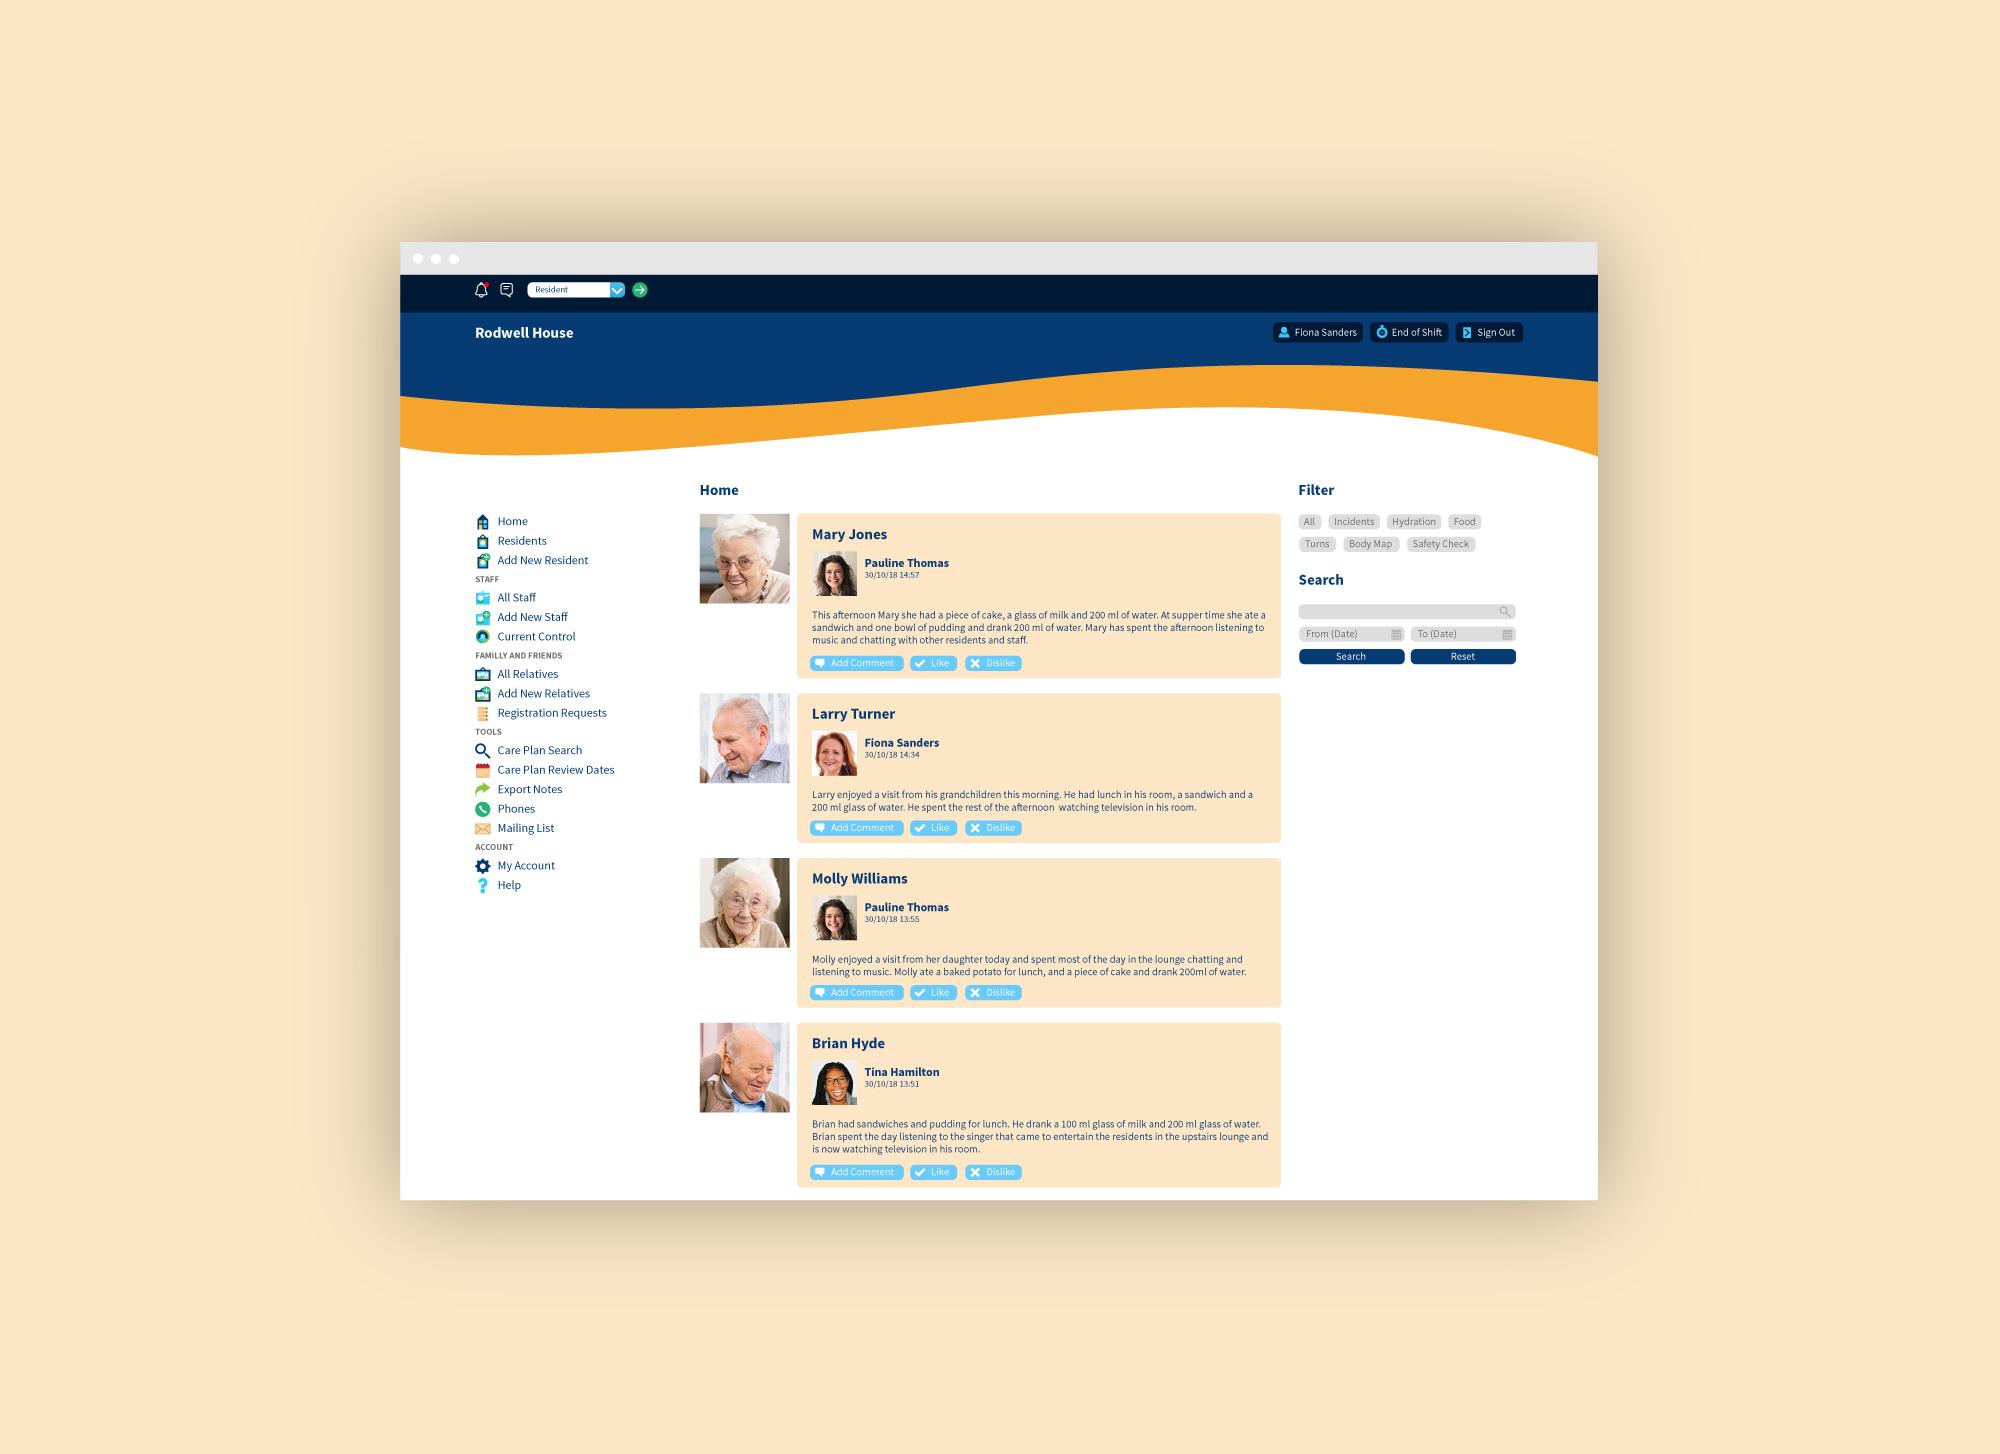 Care home management system web application for Graham Care